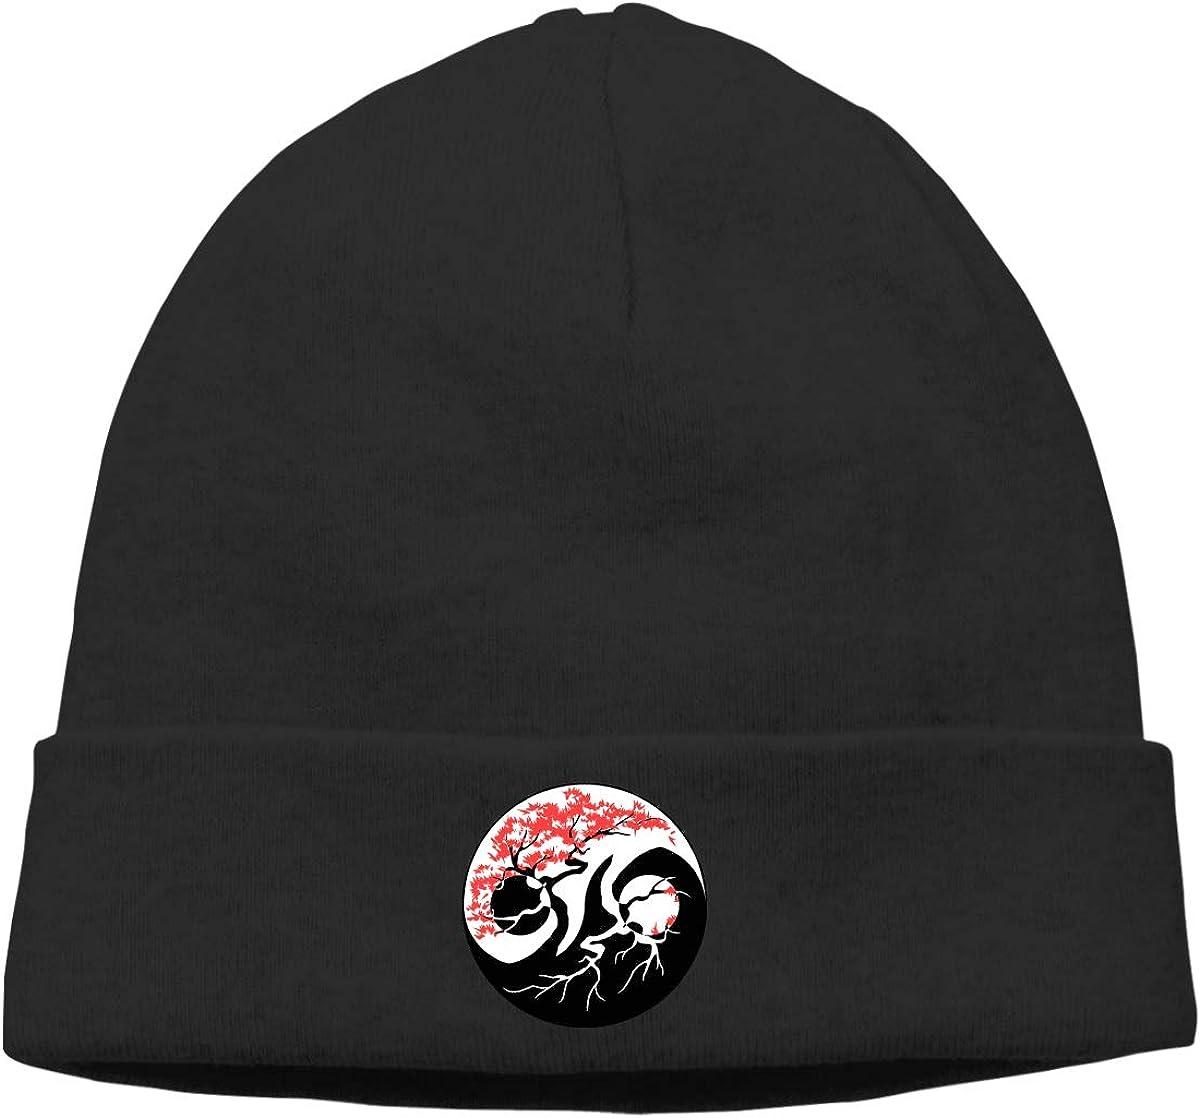 Sootot Bonsai Tree Beanie Hats Cap Mens/&Womens Warm /& Stylish Skull Cap Knit Cuff Beanie